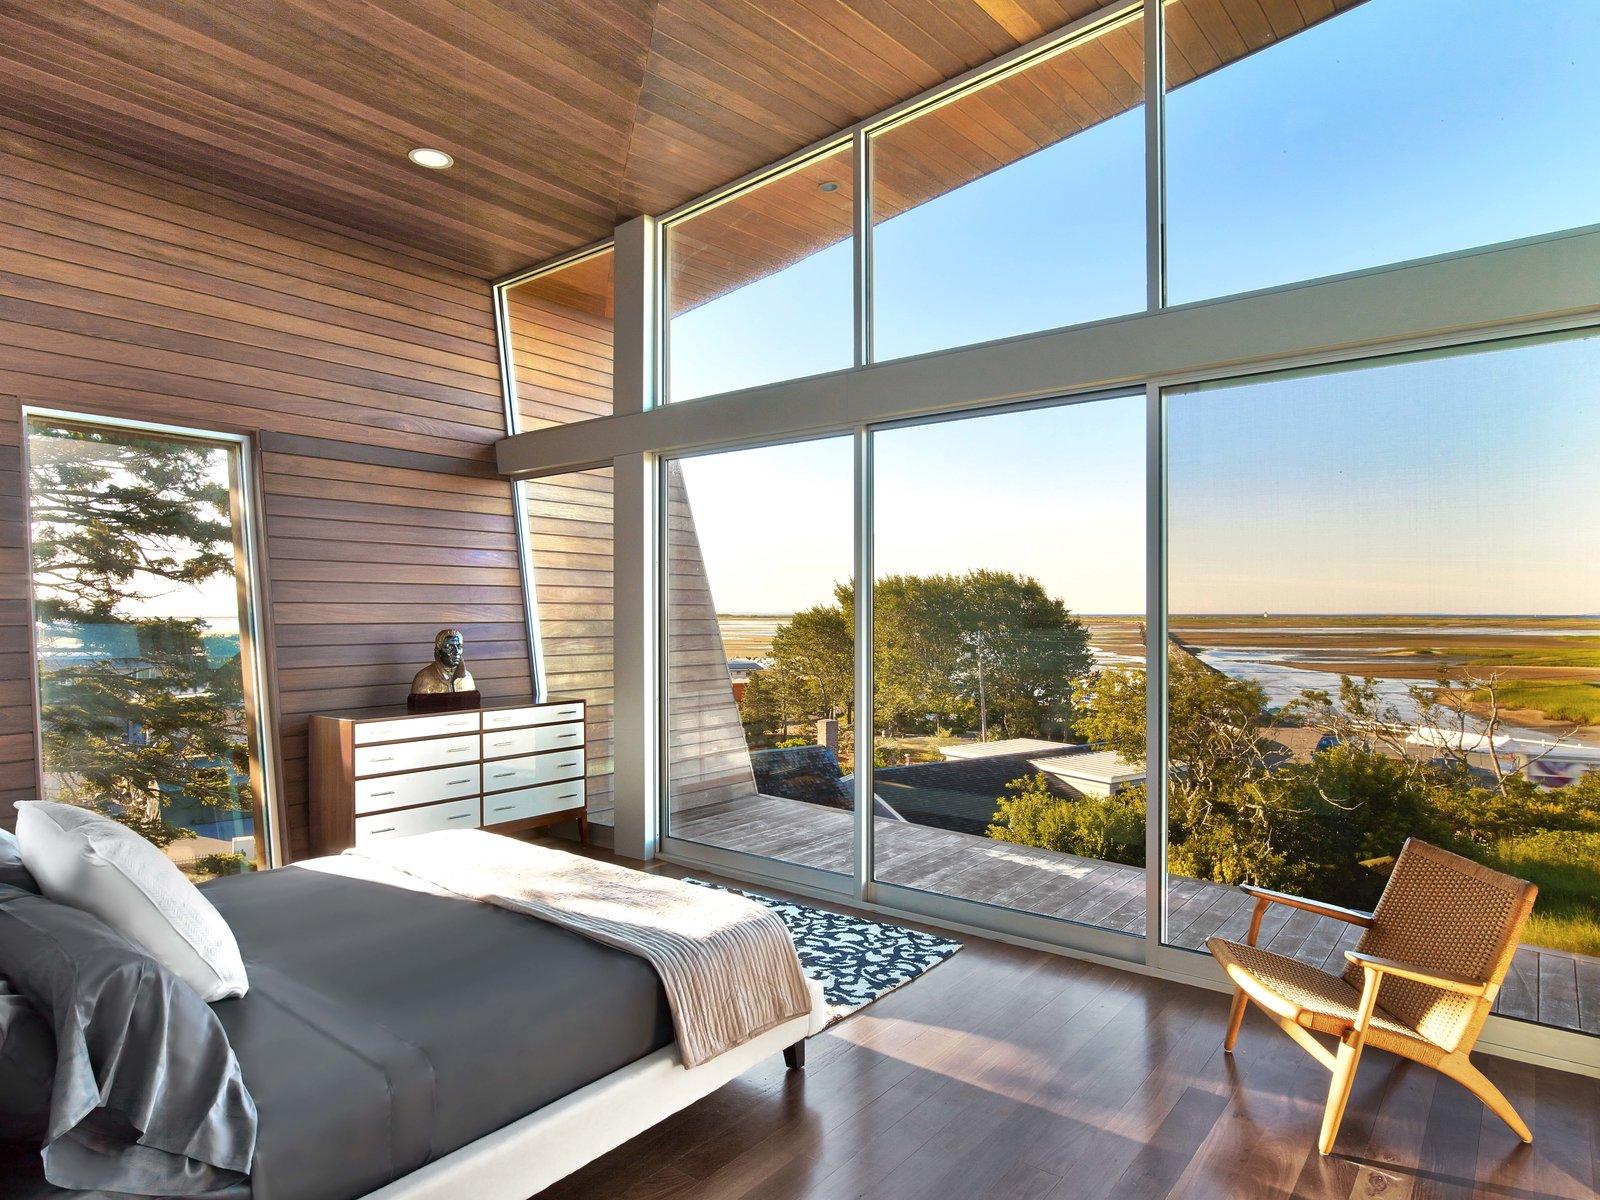 Bedroom, Ceiling Lighting, Chair, Bed, Dresser, and Medium Hardwood Floor  Cape Cod - Beach House by Hariri & Hariri Architecture